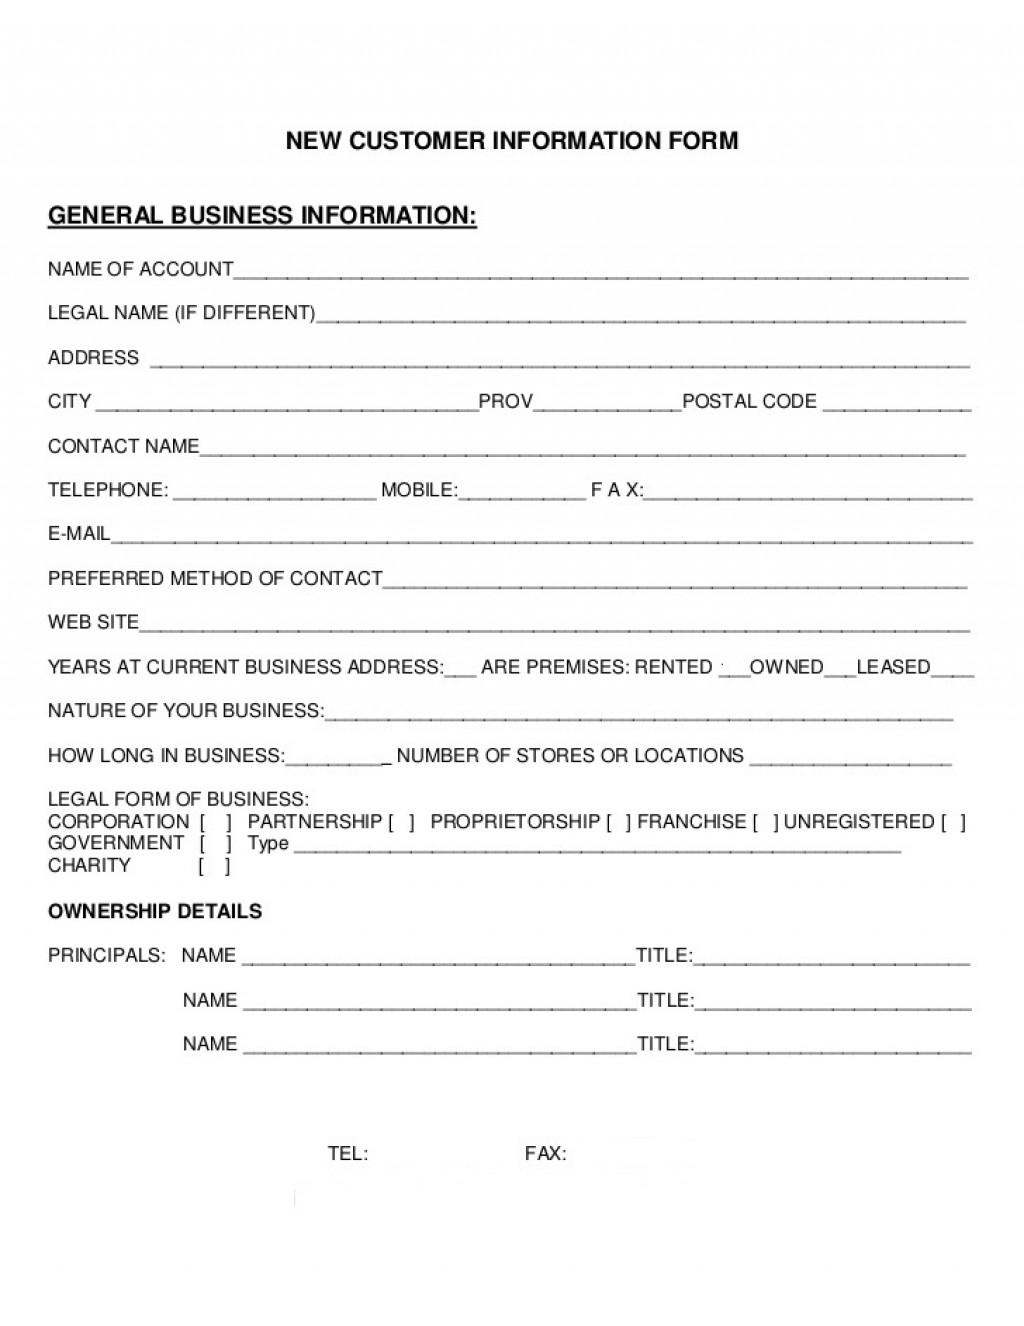 Mmu New Customer Form Template  Uk Account SetupLarge